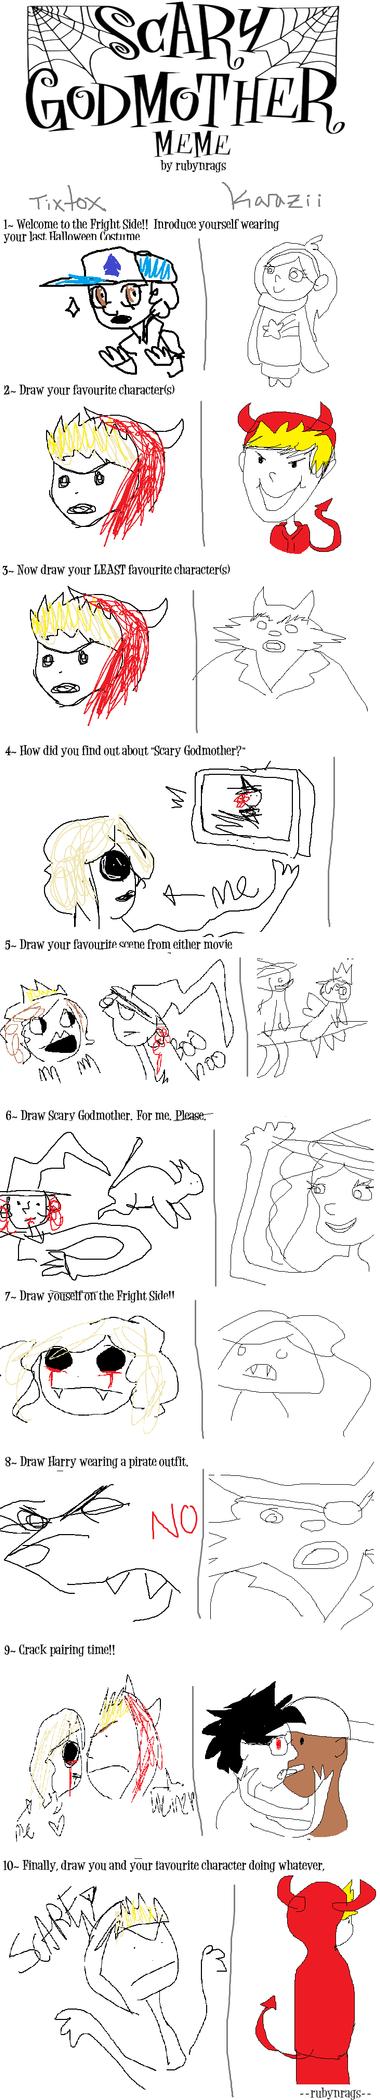 Scary Godmother Meme by karazii